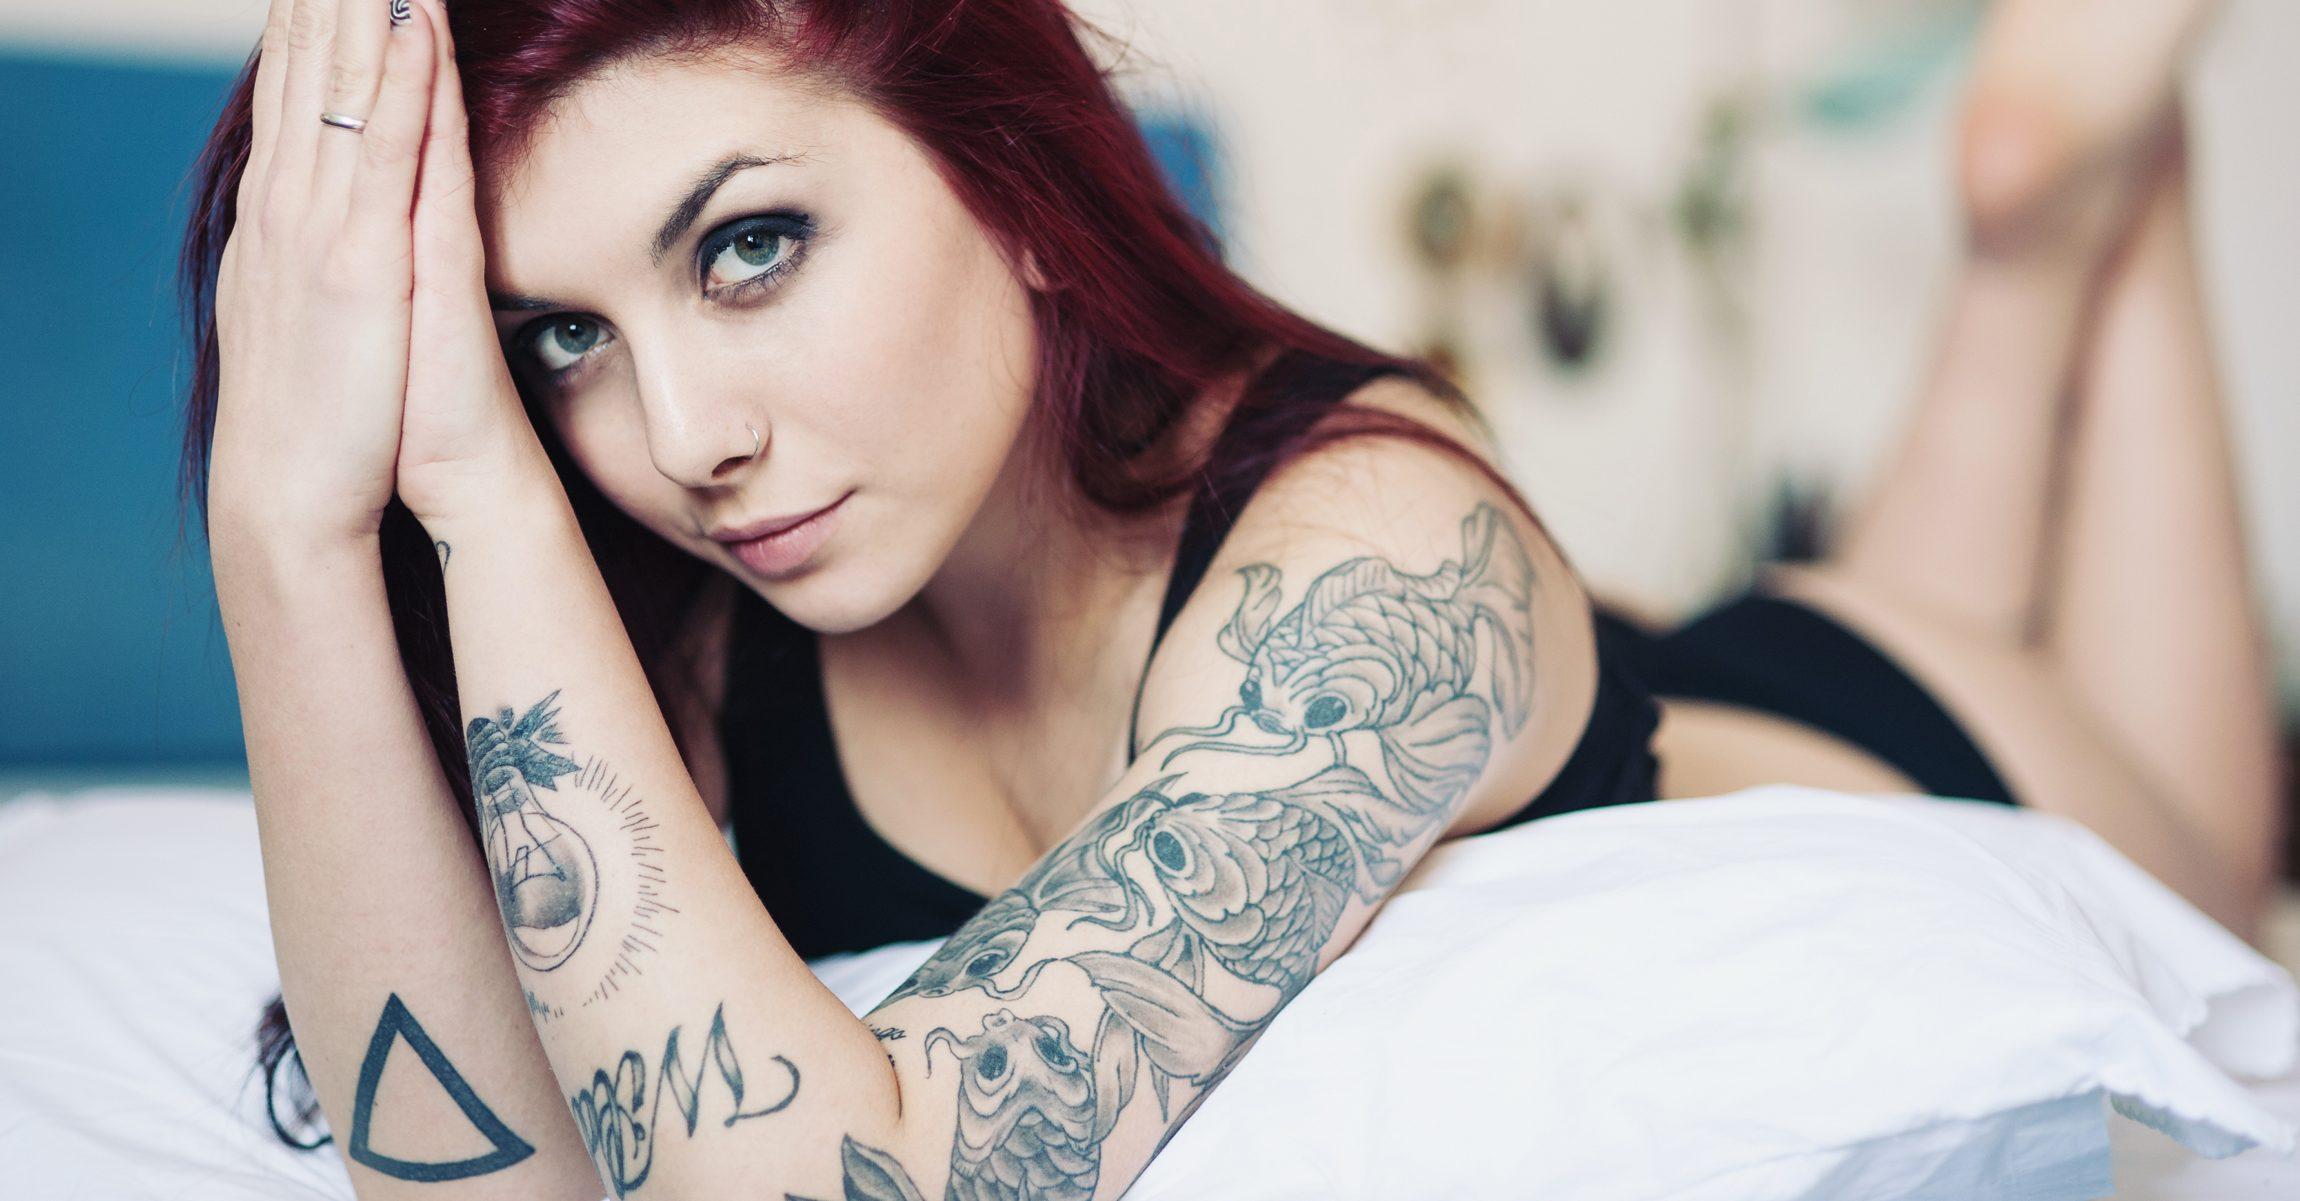 Neworld tattoo Studio